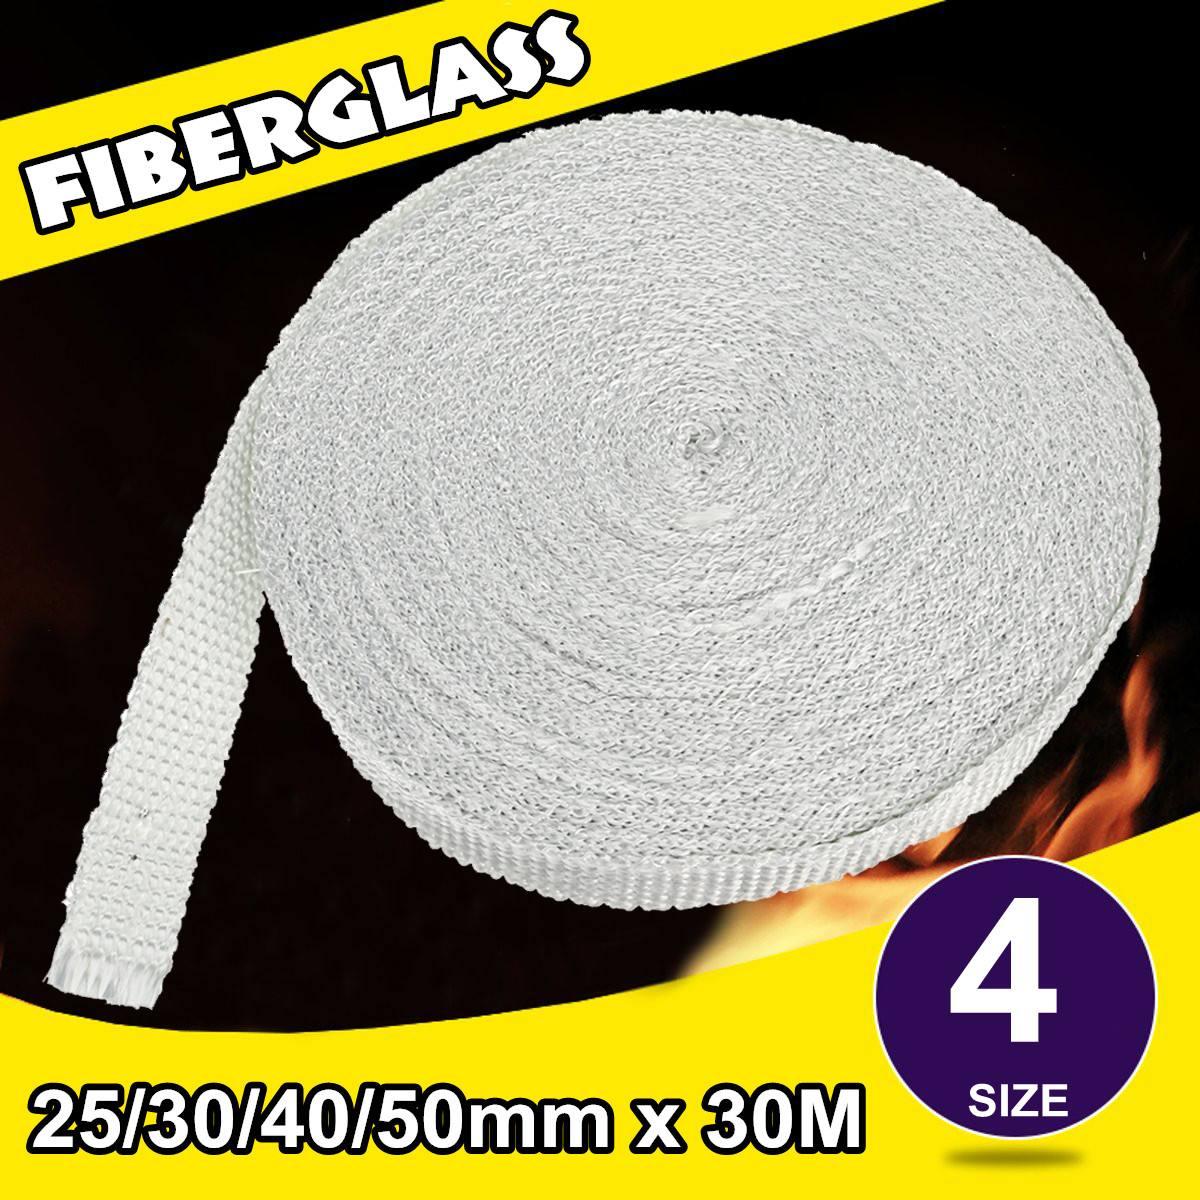 4 Size Grey Fiberglass Cloth Tape High strength Glass Fiber Fibrous Belt Resistant High Temperature Fiberglass Sealing Tape